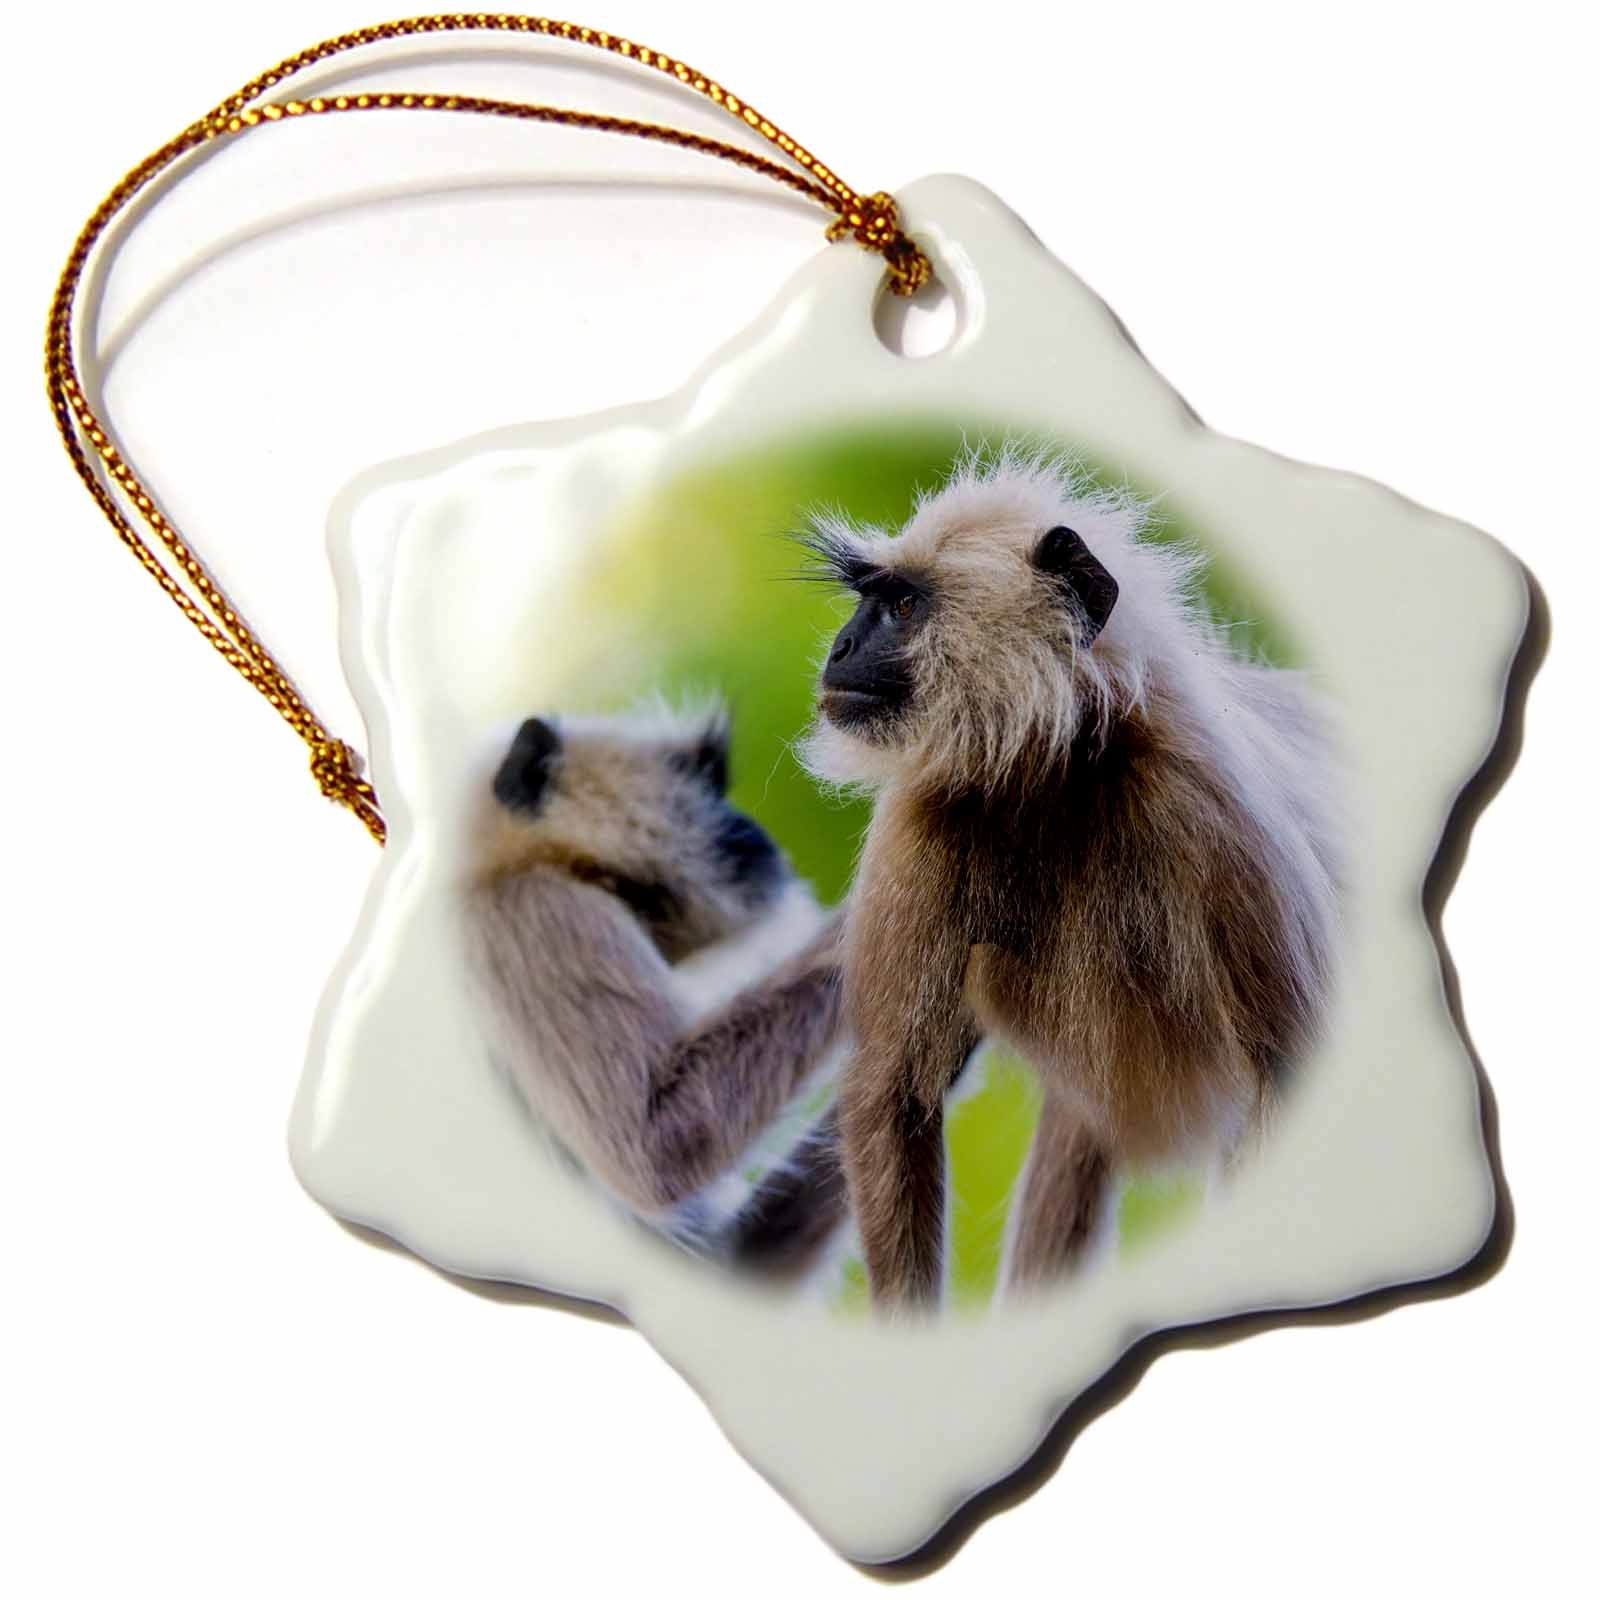 3dRose Danita Delimont - Primates - India. Kanha Tiger Reserve, Hanuman langur grooming eachother. - 3 inch Snowflake Porcelain Ornament (orn_276779_1)